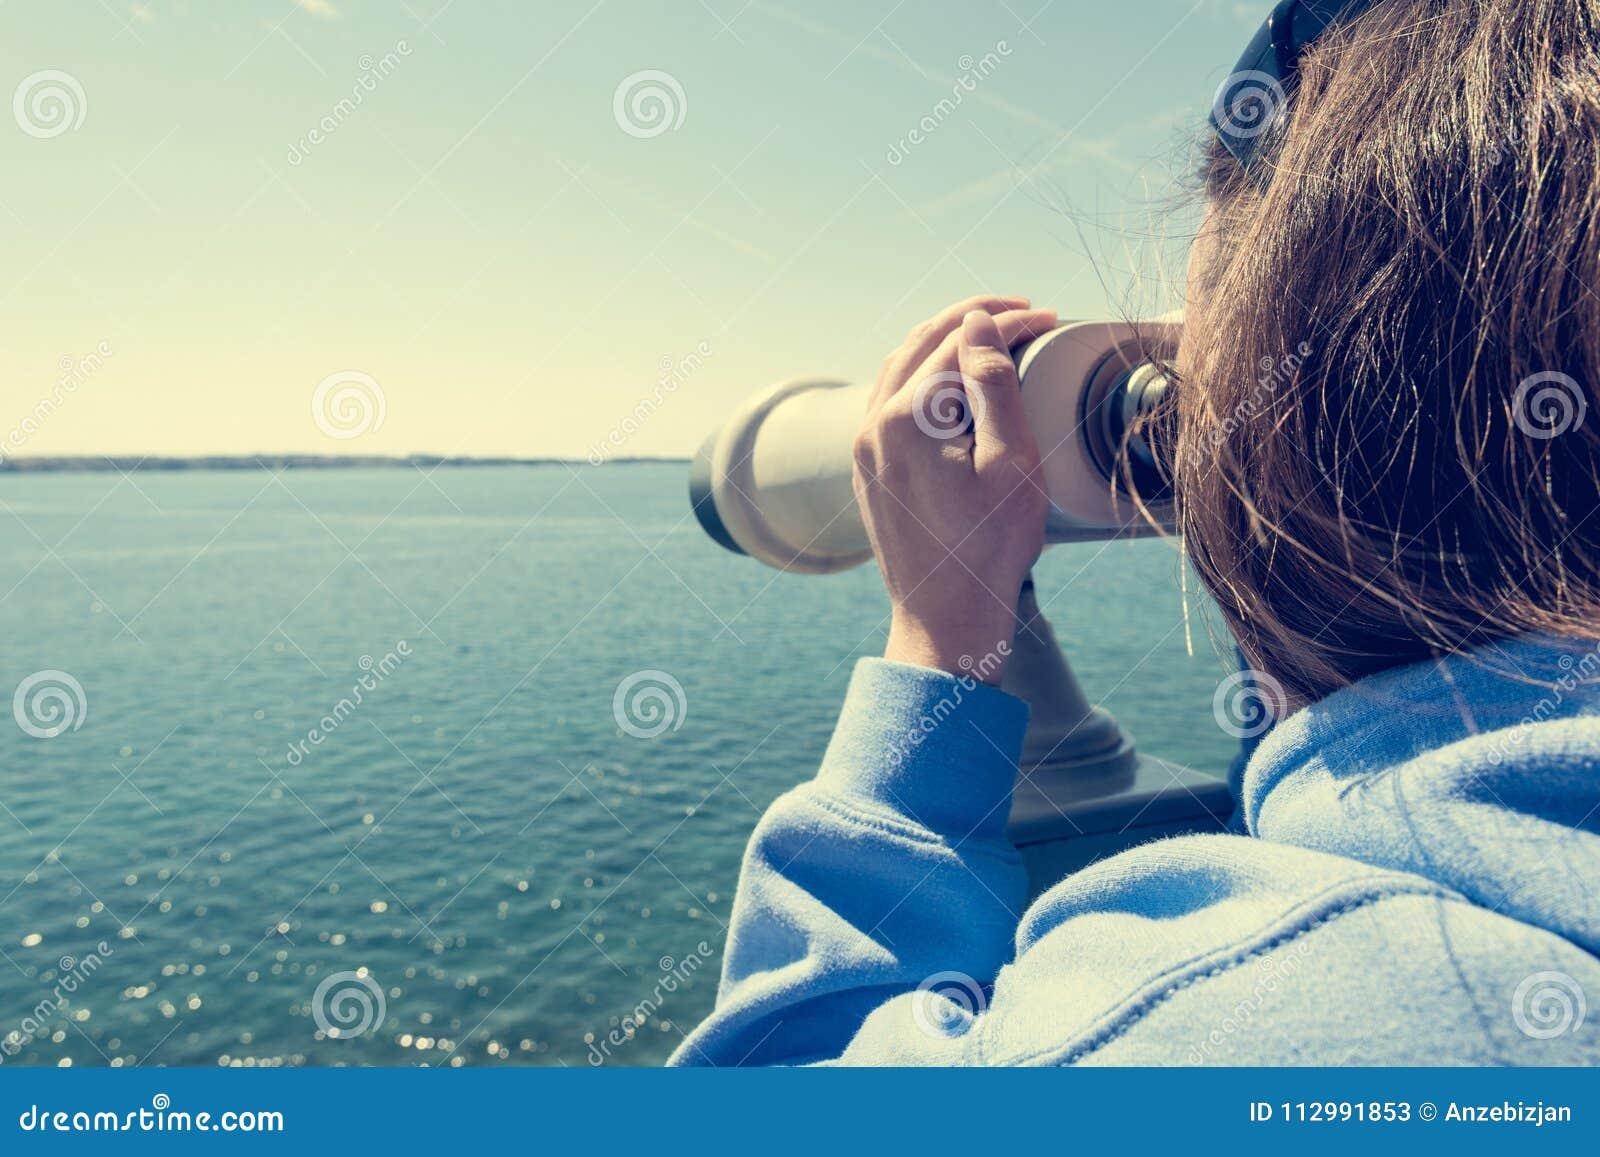 Woman looking through coin operated binoculars at seaside.